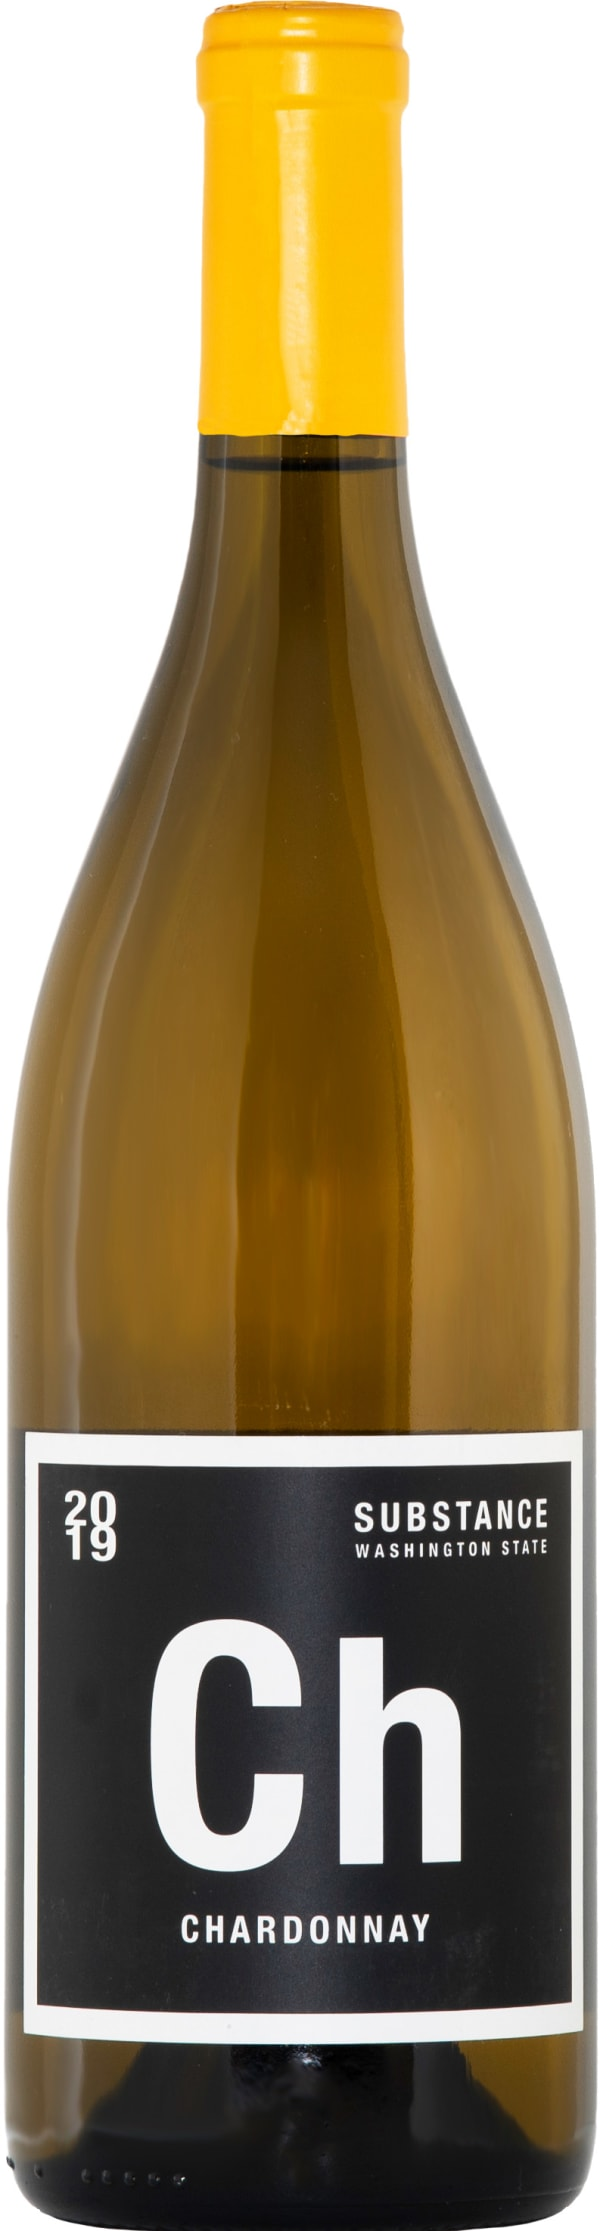 Substance Ch Chardonnay 2018